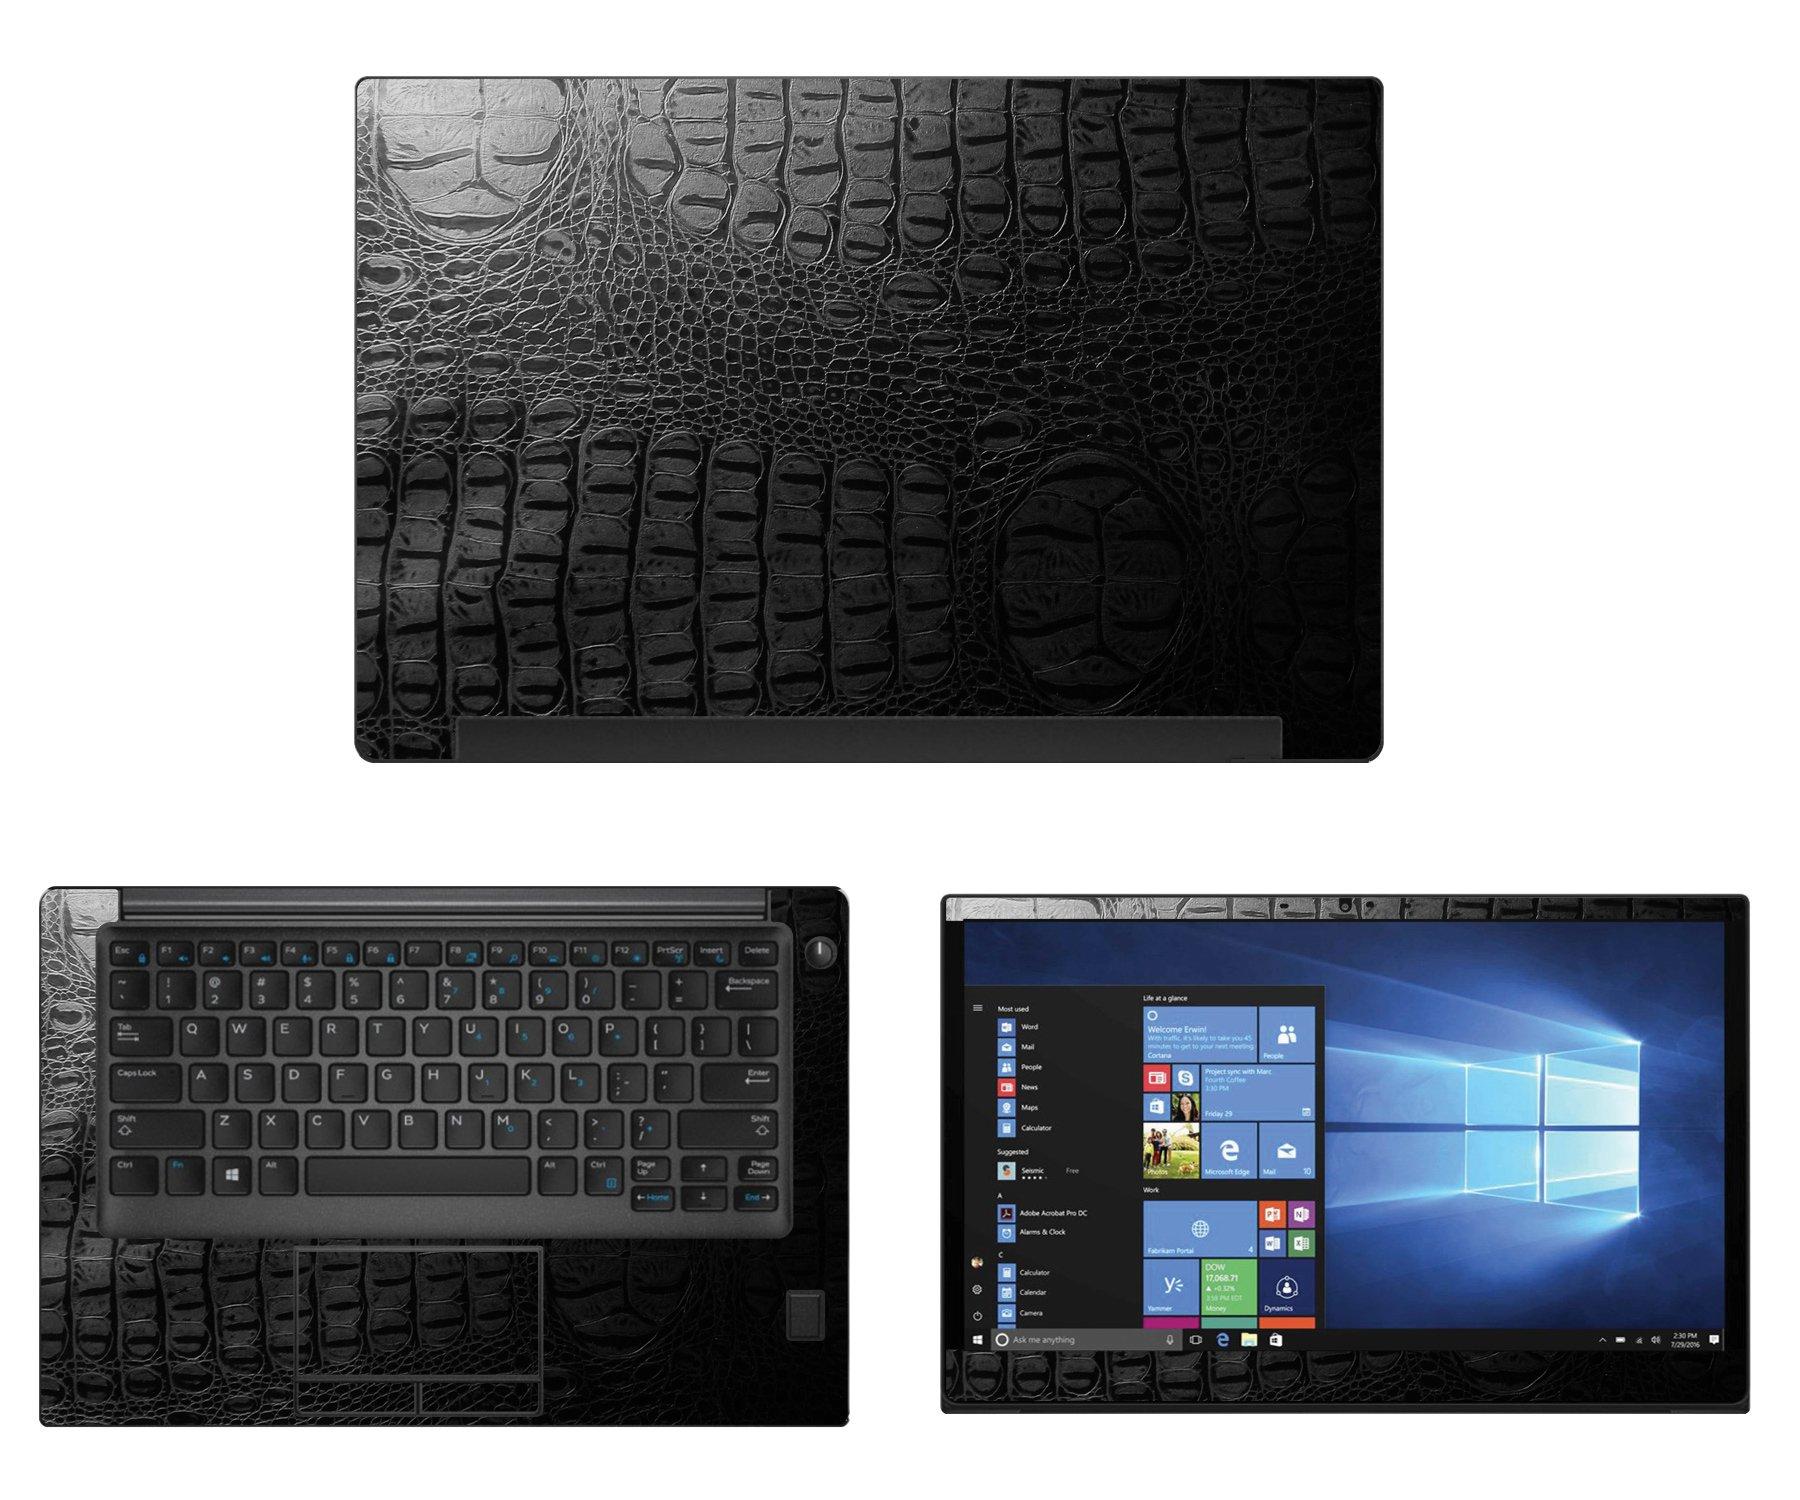 Decalrus - Protective decal for Dell Latitude 7480 (14'' Screen) Laptop Crocodile skin pattern Texture skin case cover wrap CROdellLatitude7480Black